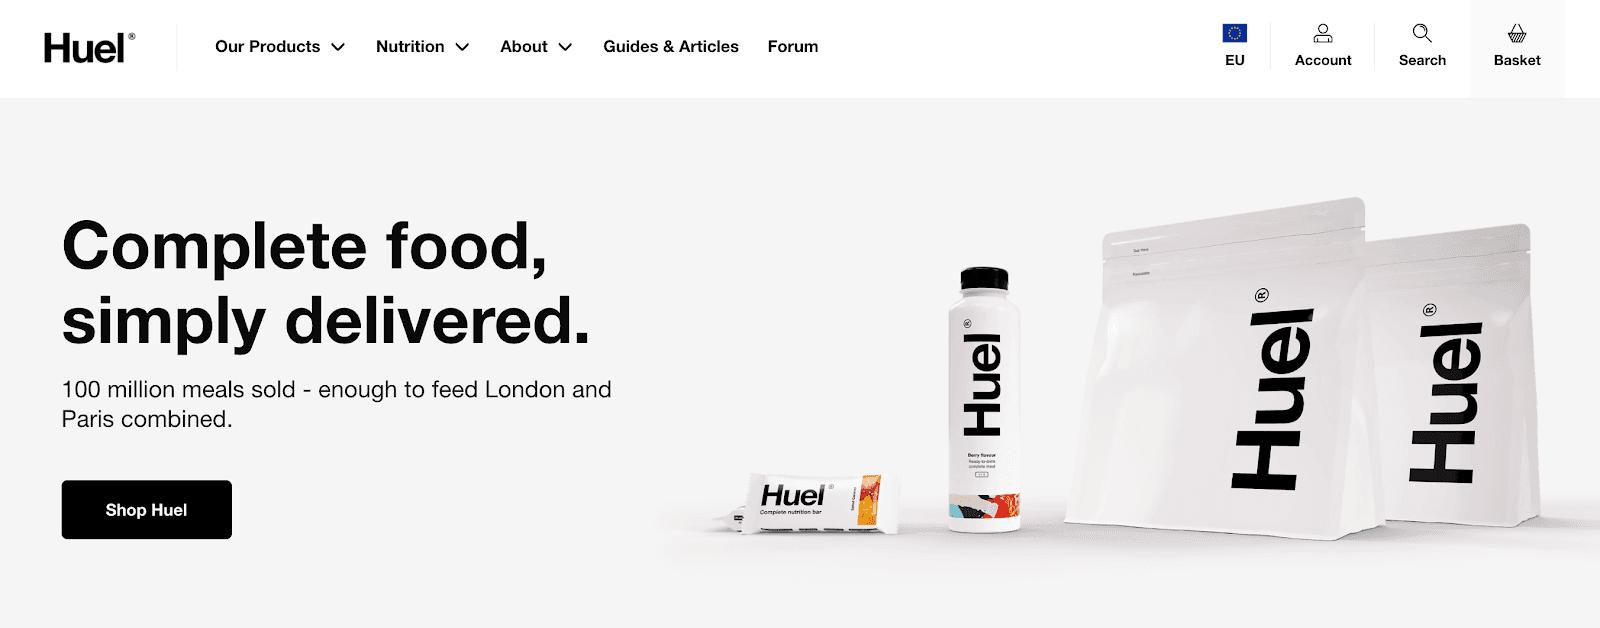 Website homepage for Huel